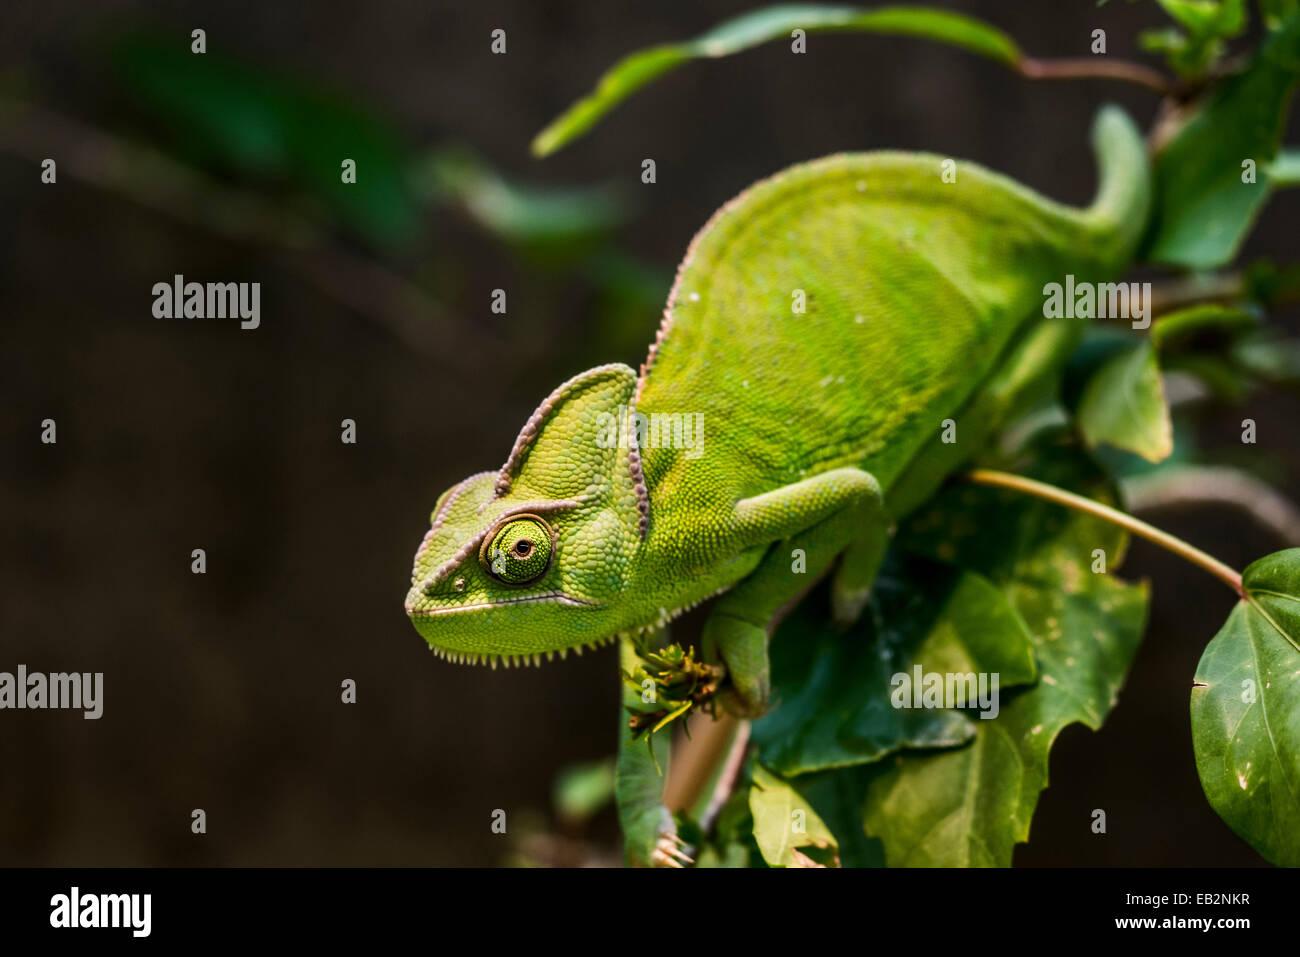 Jemen Chamäleon oder verschleiert Chamäleon (Chamaeleo Calyptratus), Wilhelma Zoo und Botanischer Garten, Stockbild